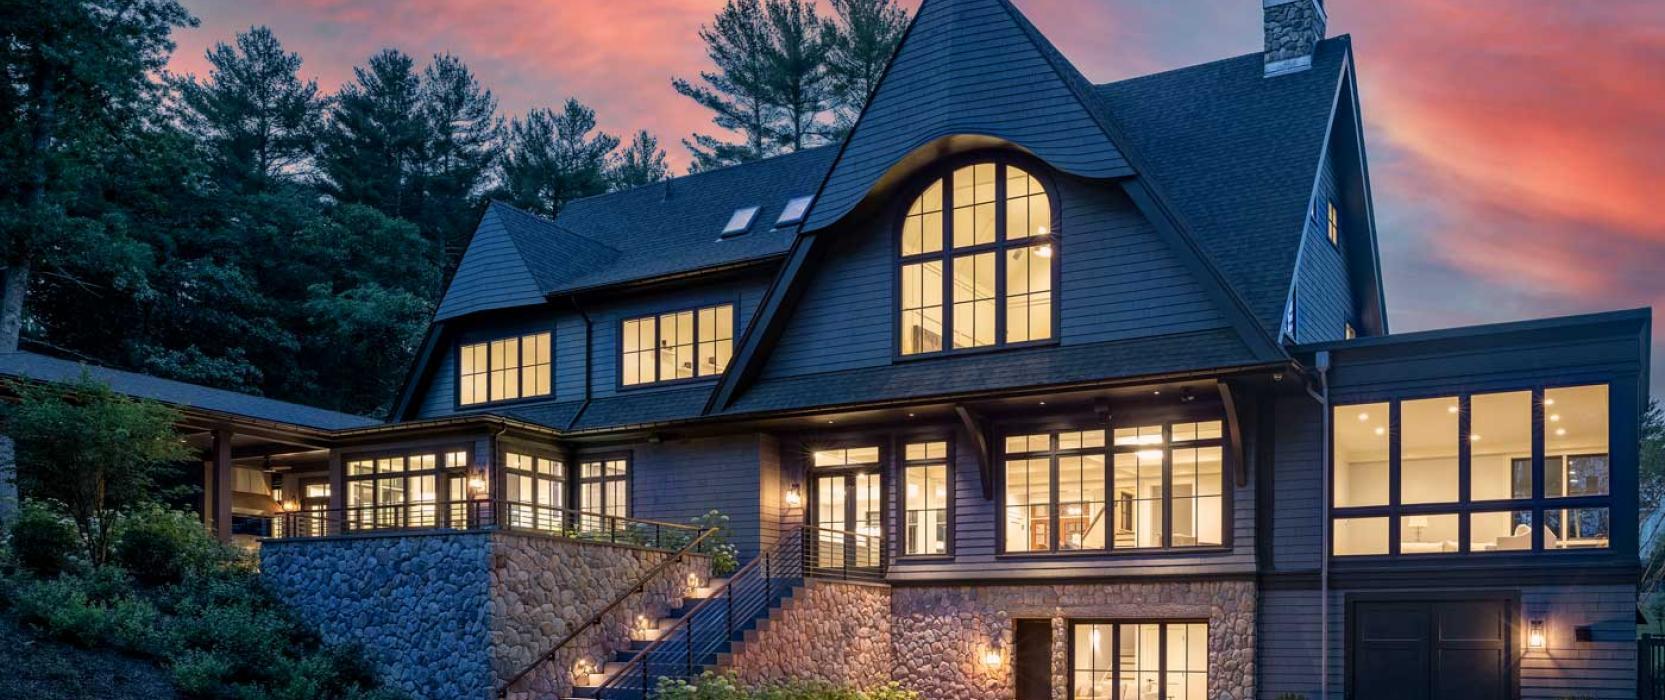 Dusk view of custom designed Needham home